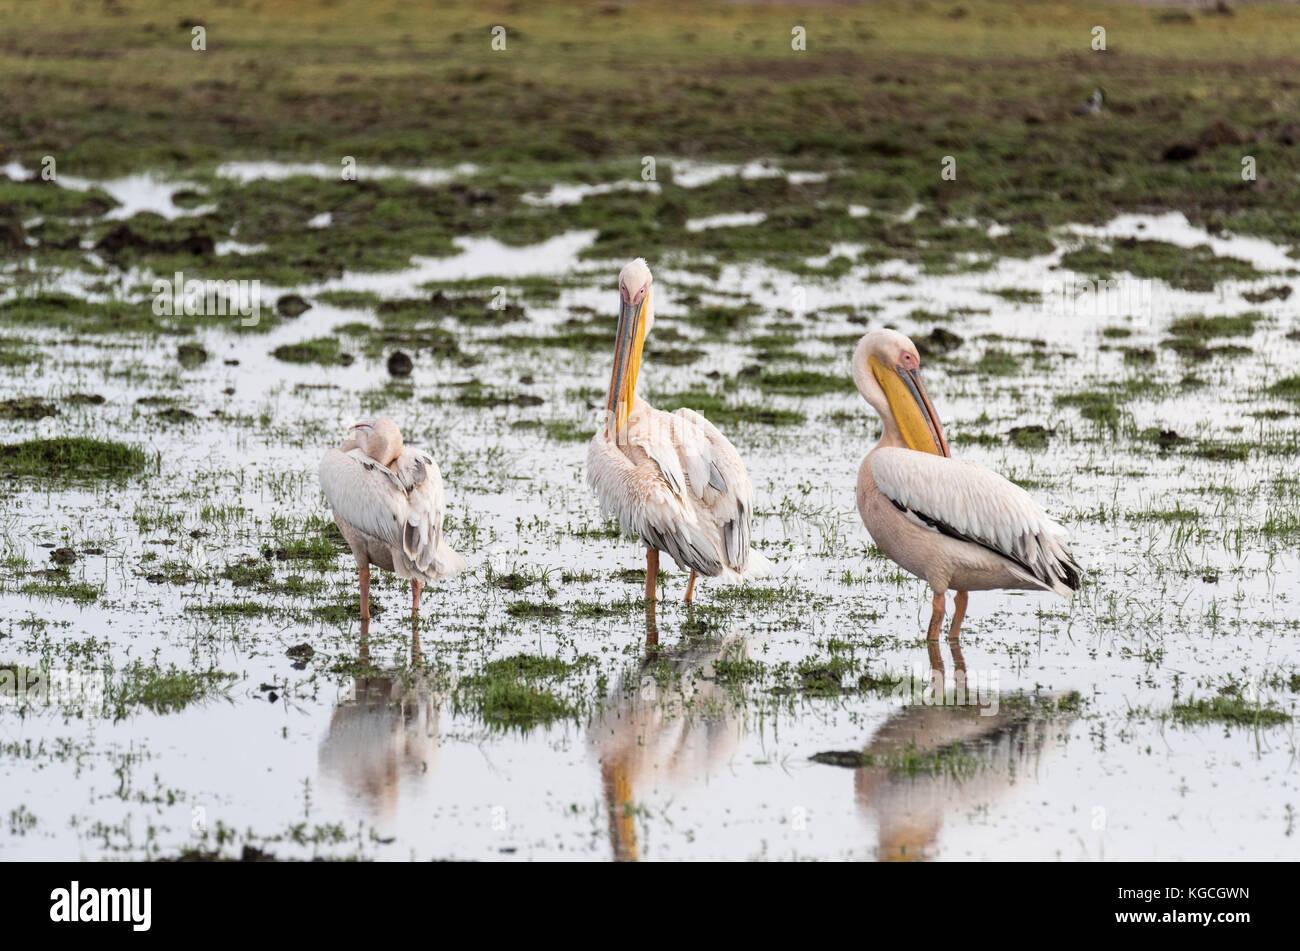 Three preening Great White Pelicans (Pelecanus onocrotalus) Stock Photo